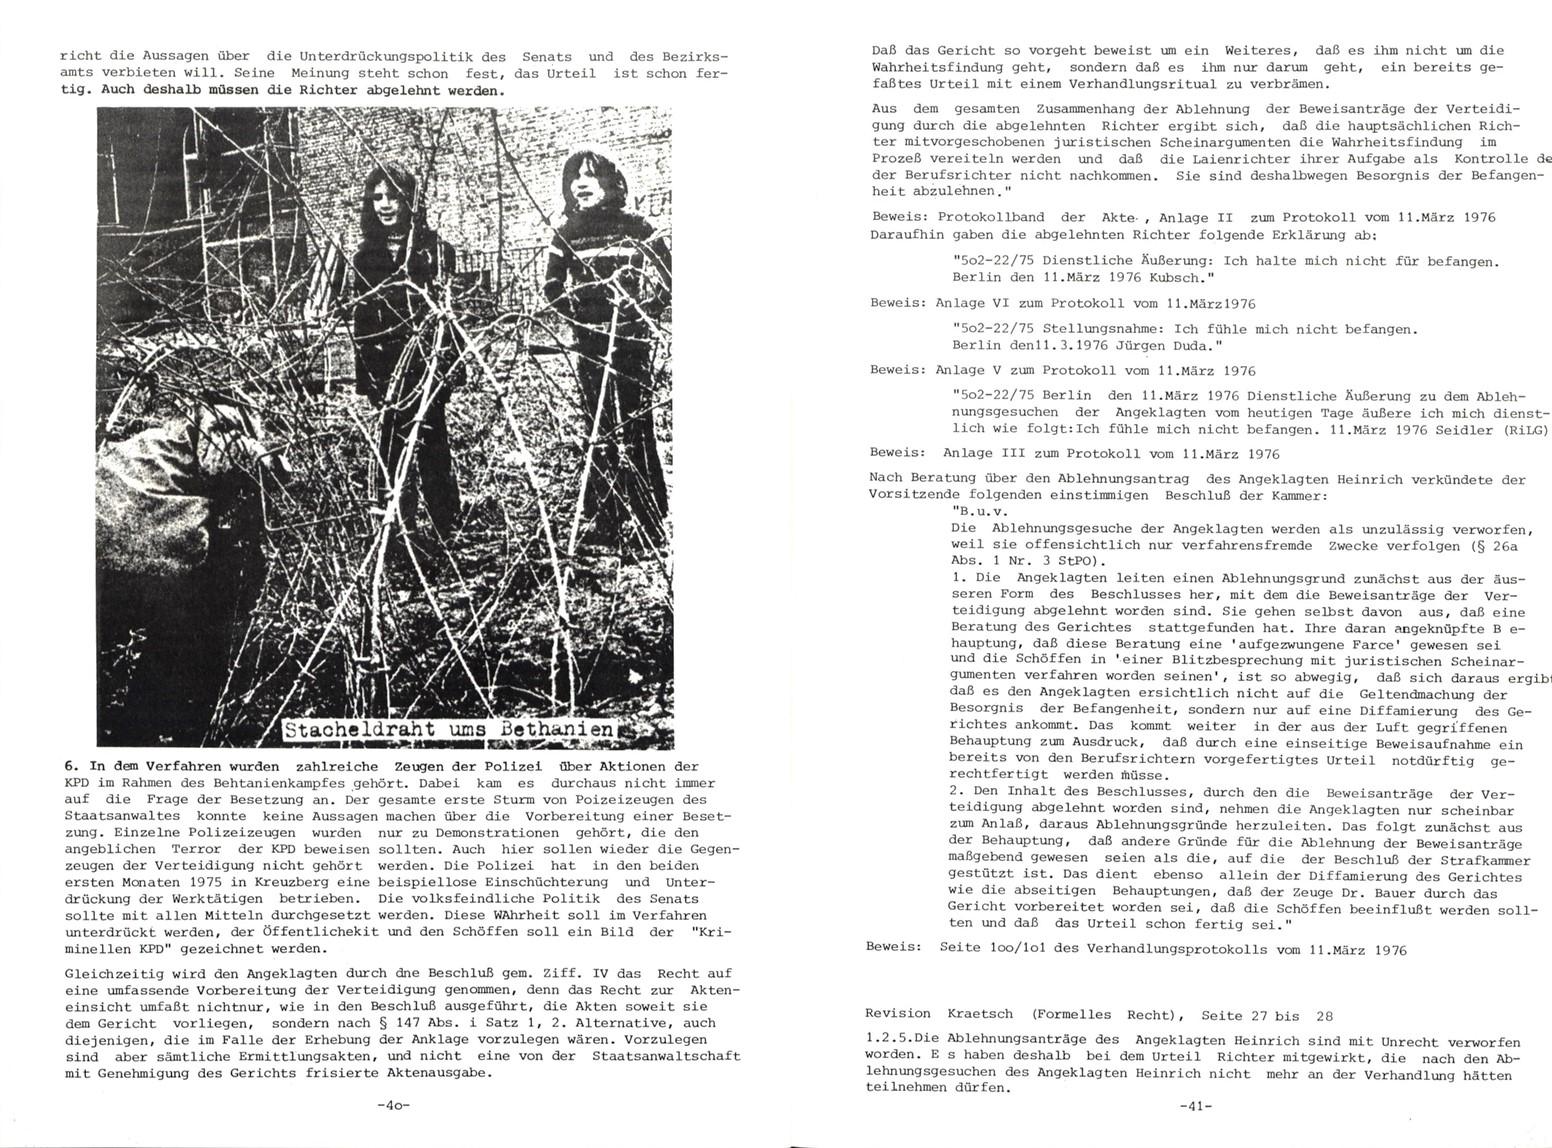 KPDAO_1976_Staatsschutzparagrafen_21